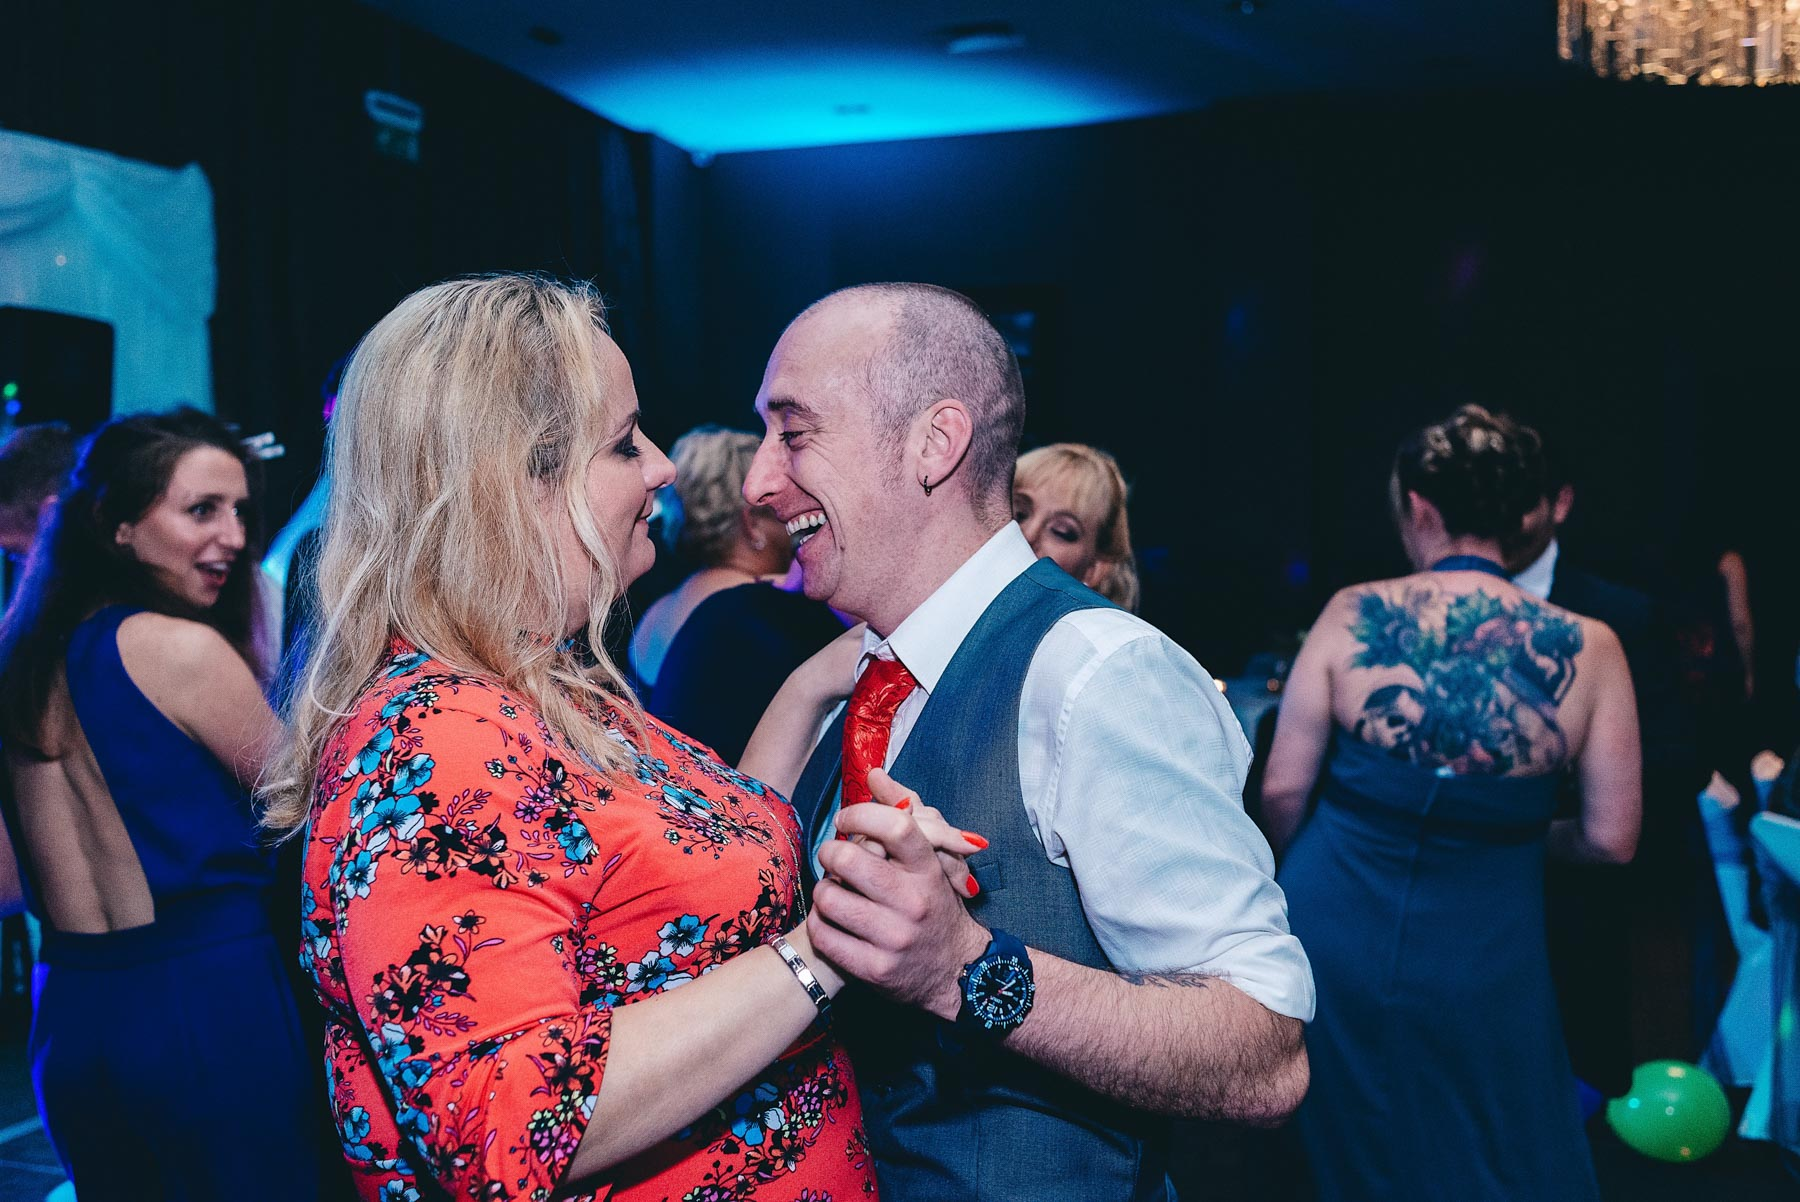 Couple enjoy dancing at wedding